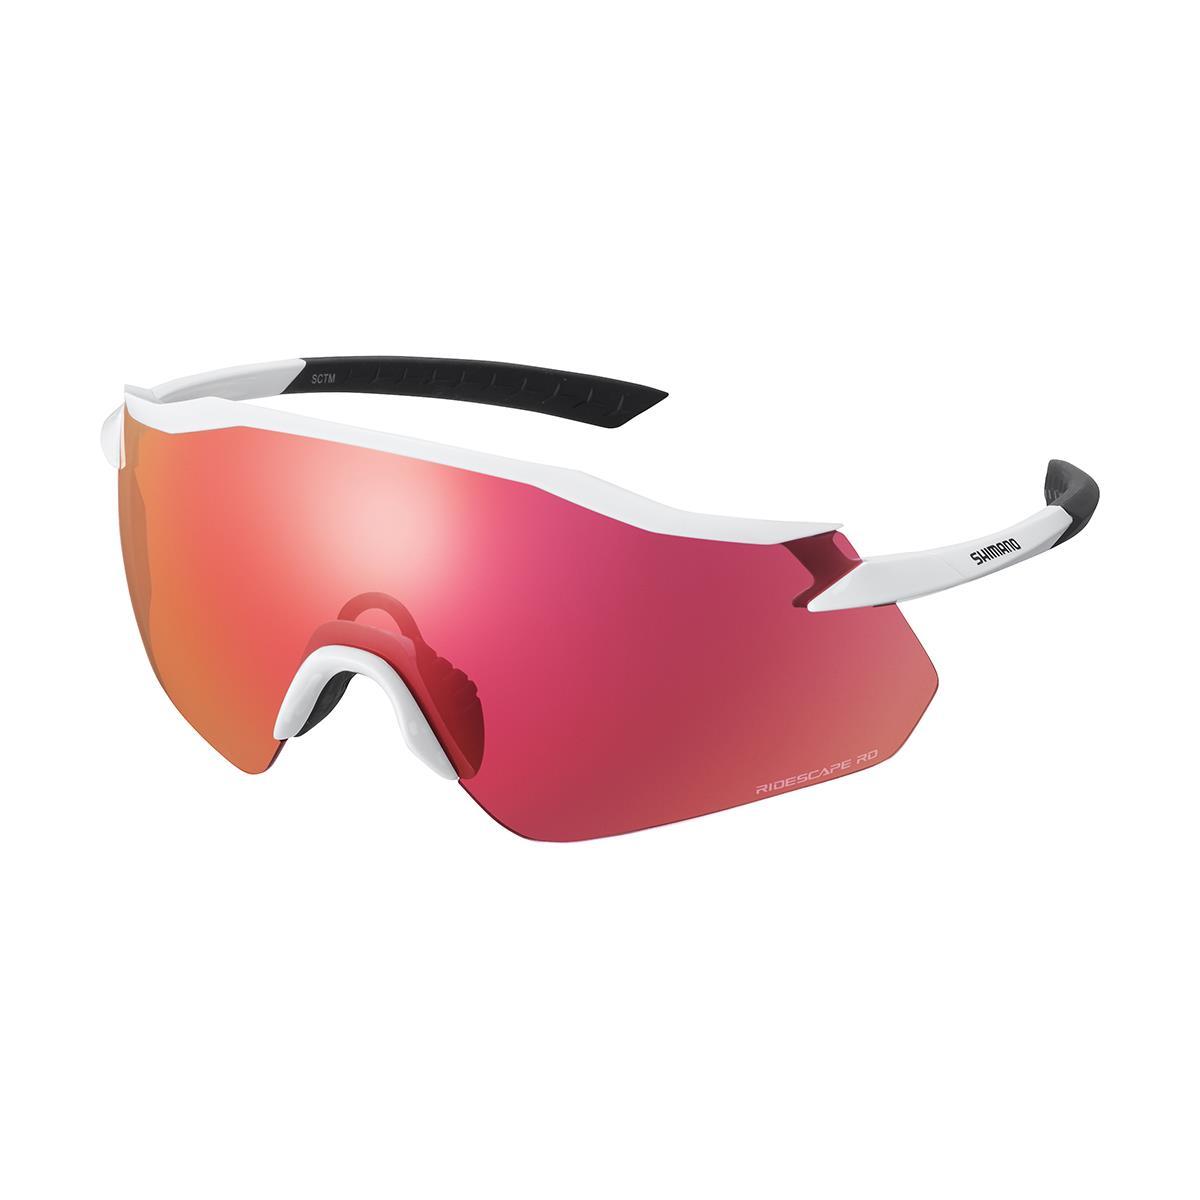 Equinox Sunglasses White / Ridescape RD Road Lens